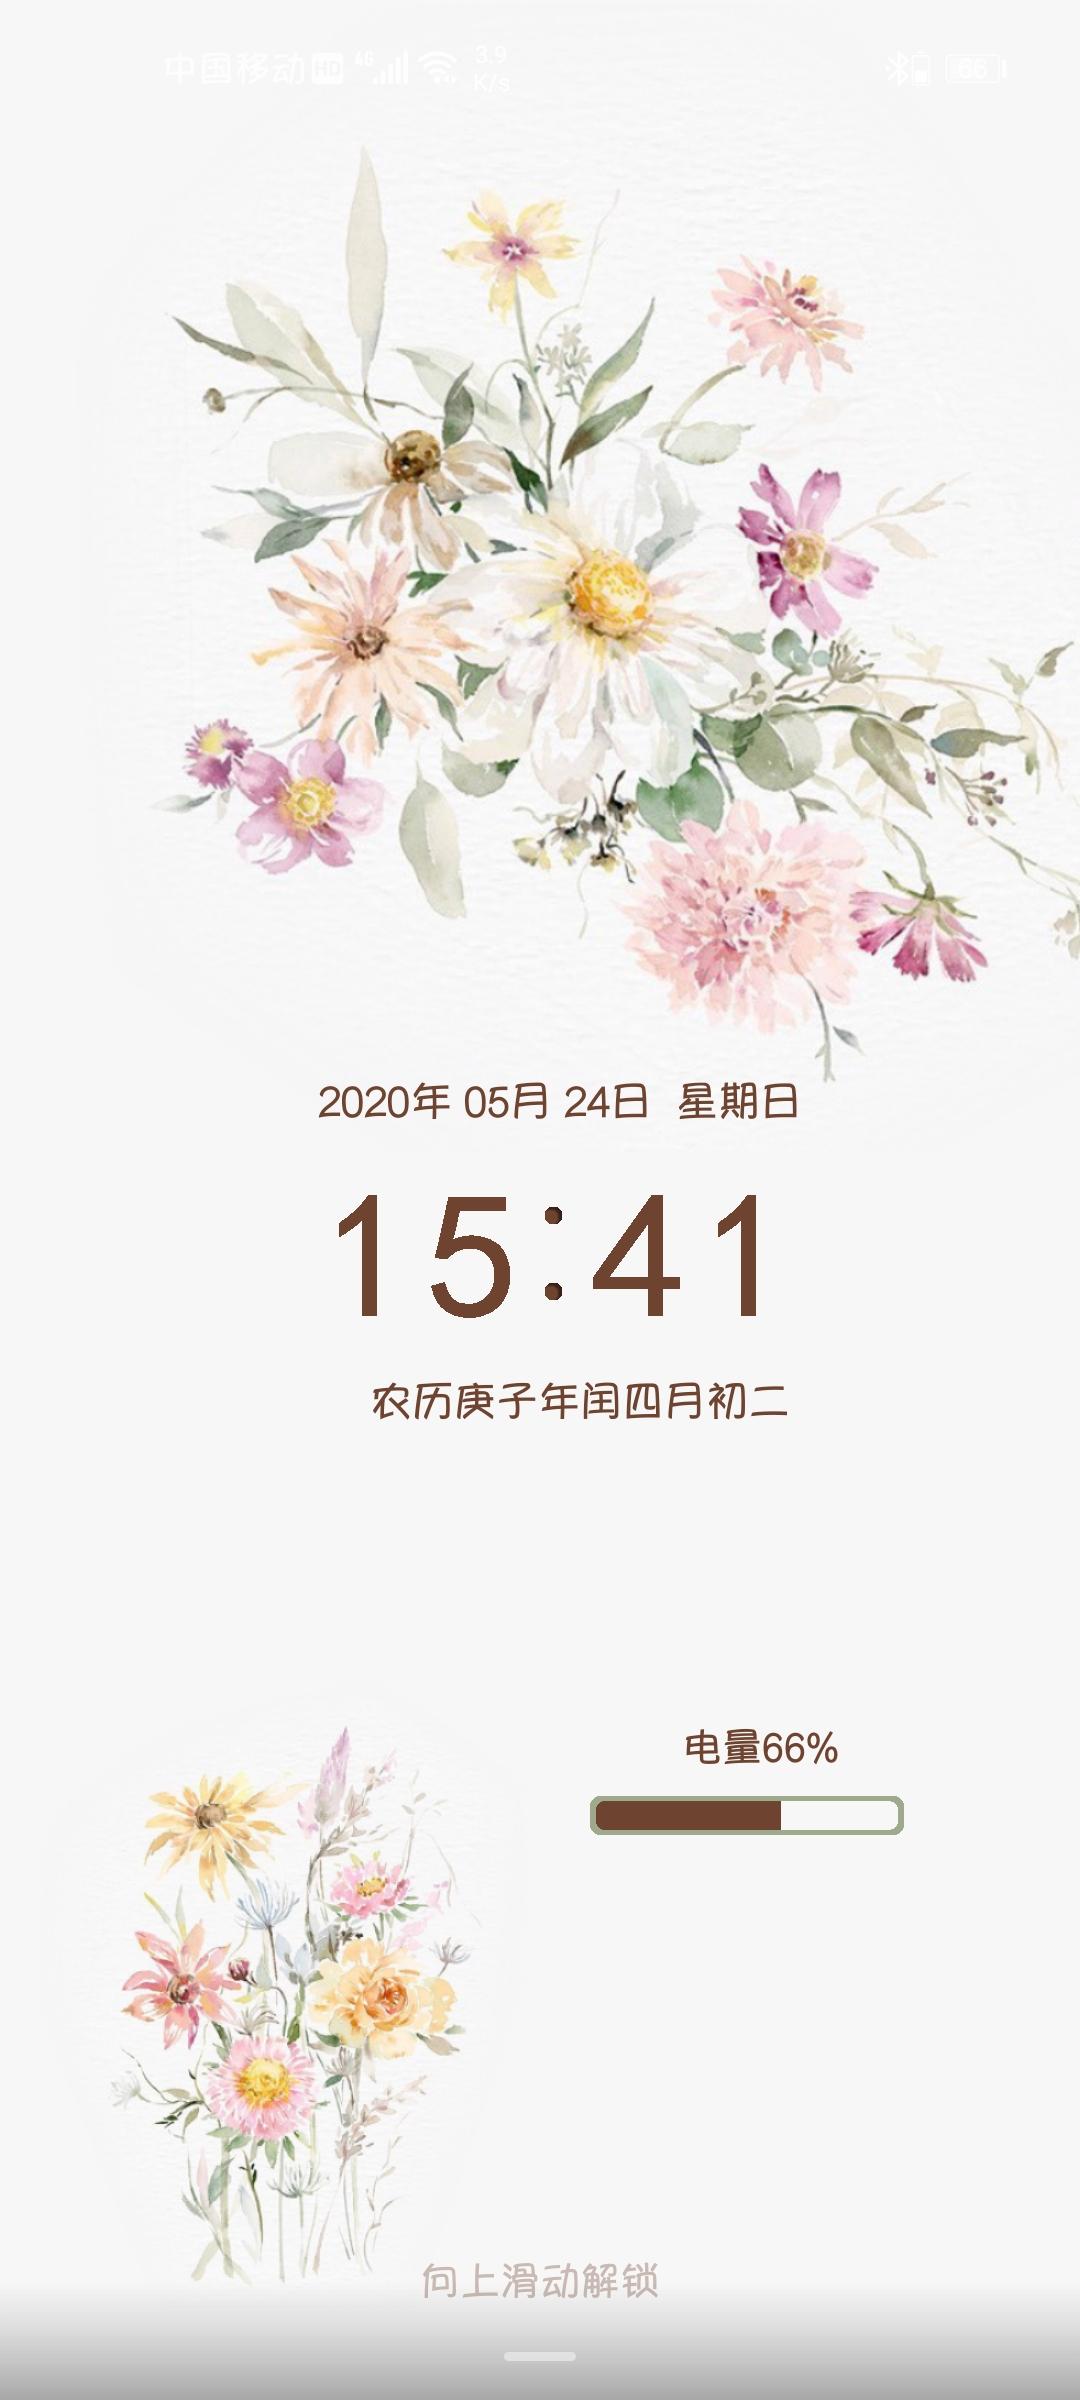 Screenshot_20200524_154114_com.android.keyguard.jpg